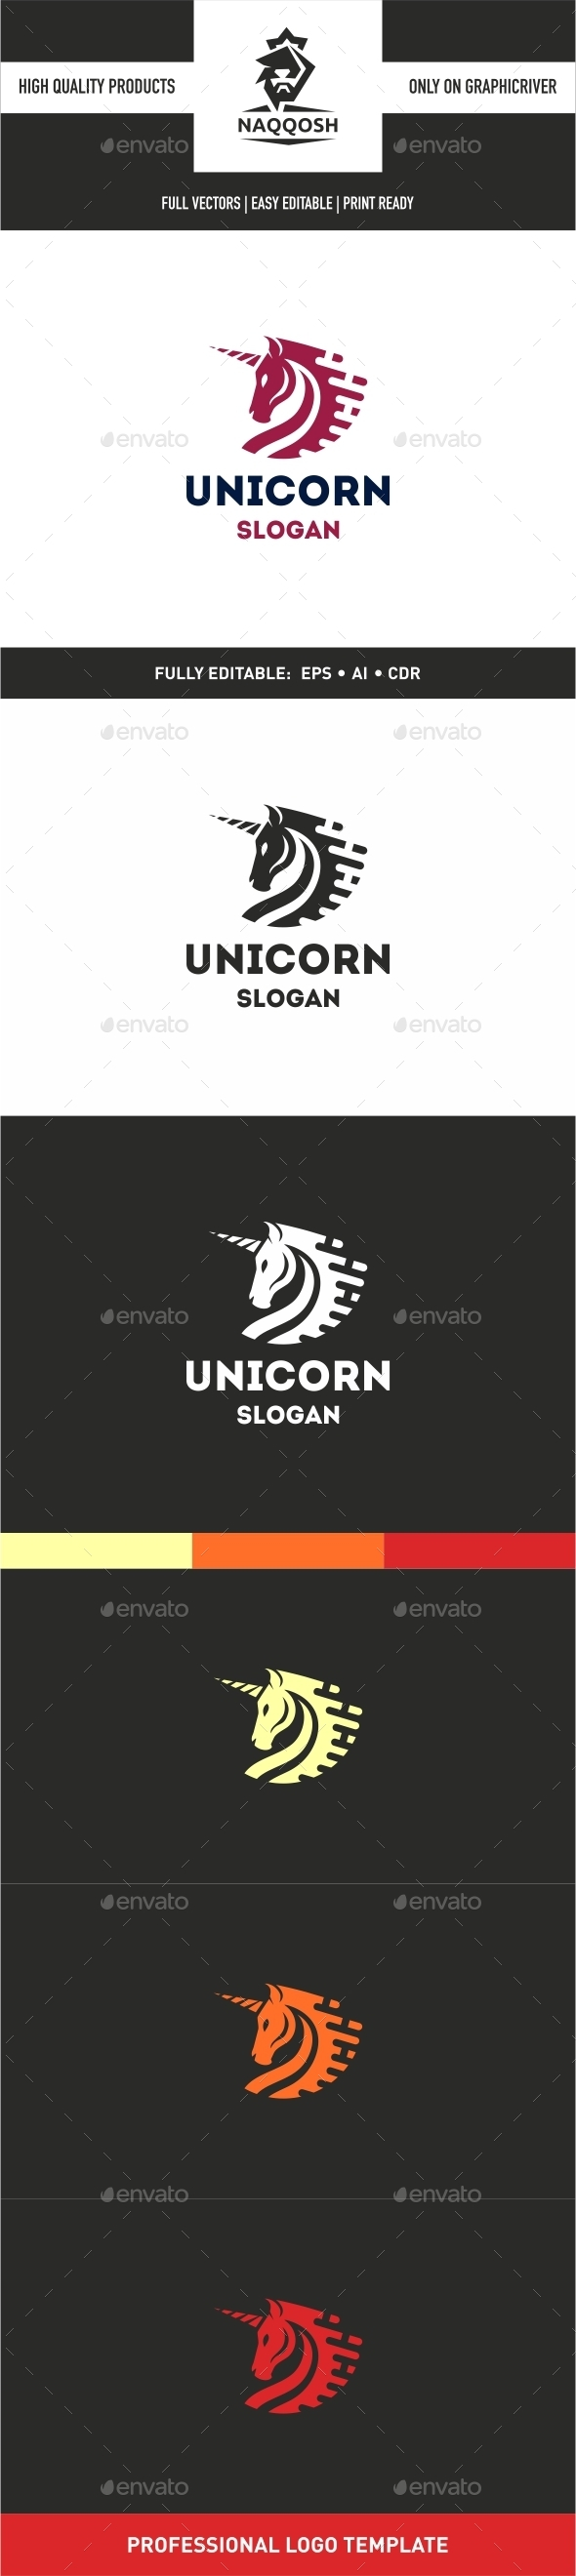 Unicorn Logo - Symbols Logo Templates